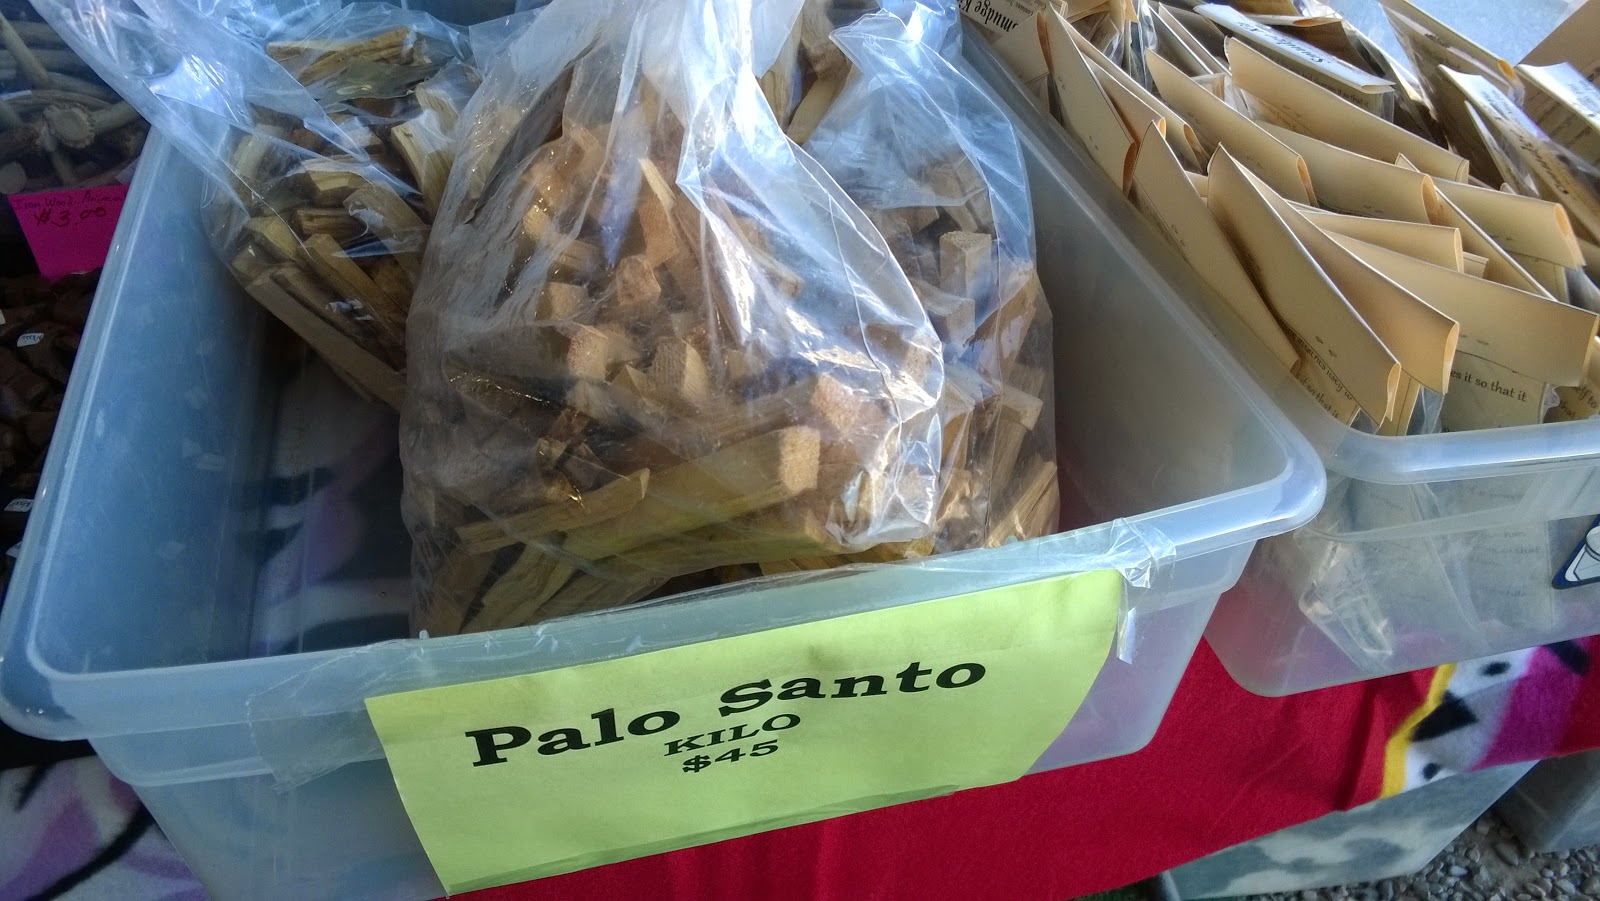 Paolo Santo wood sticks